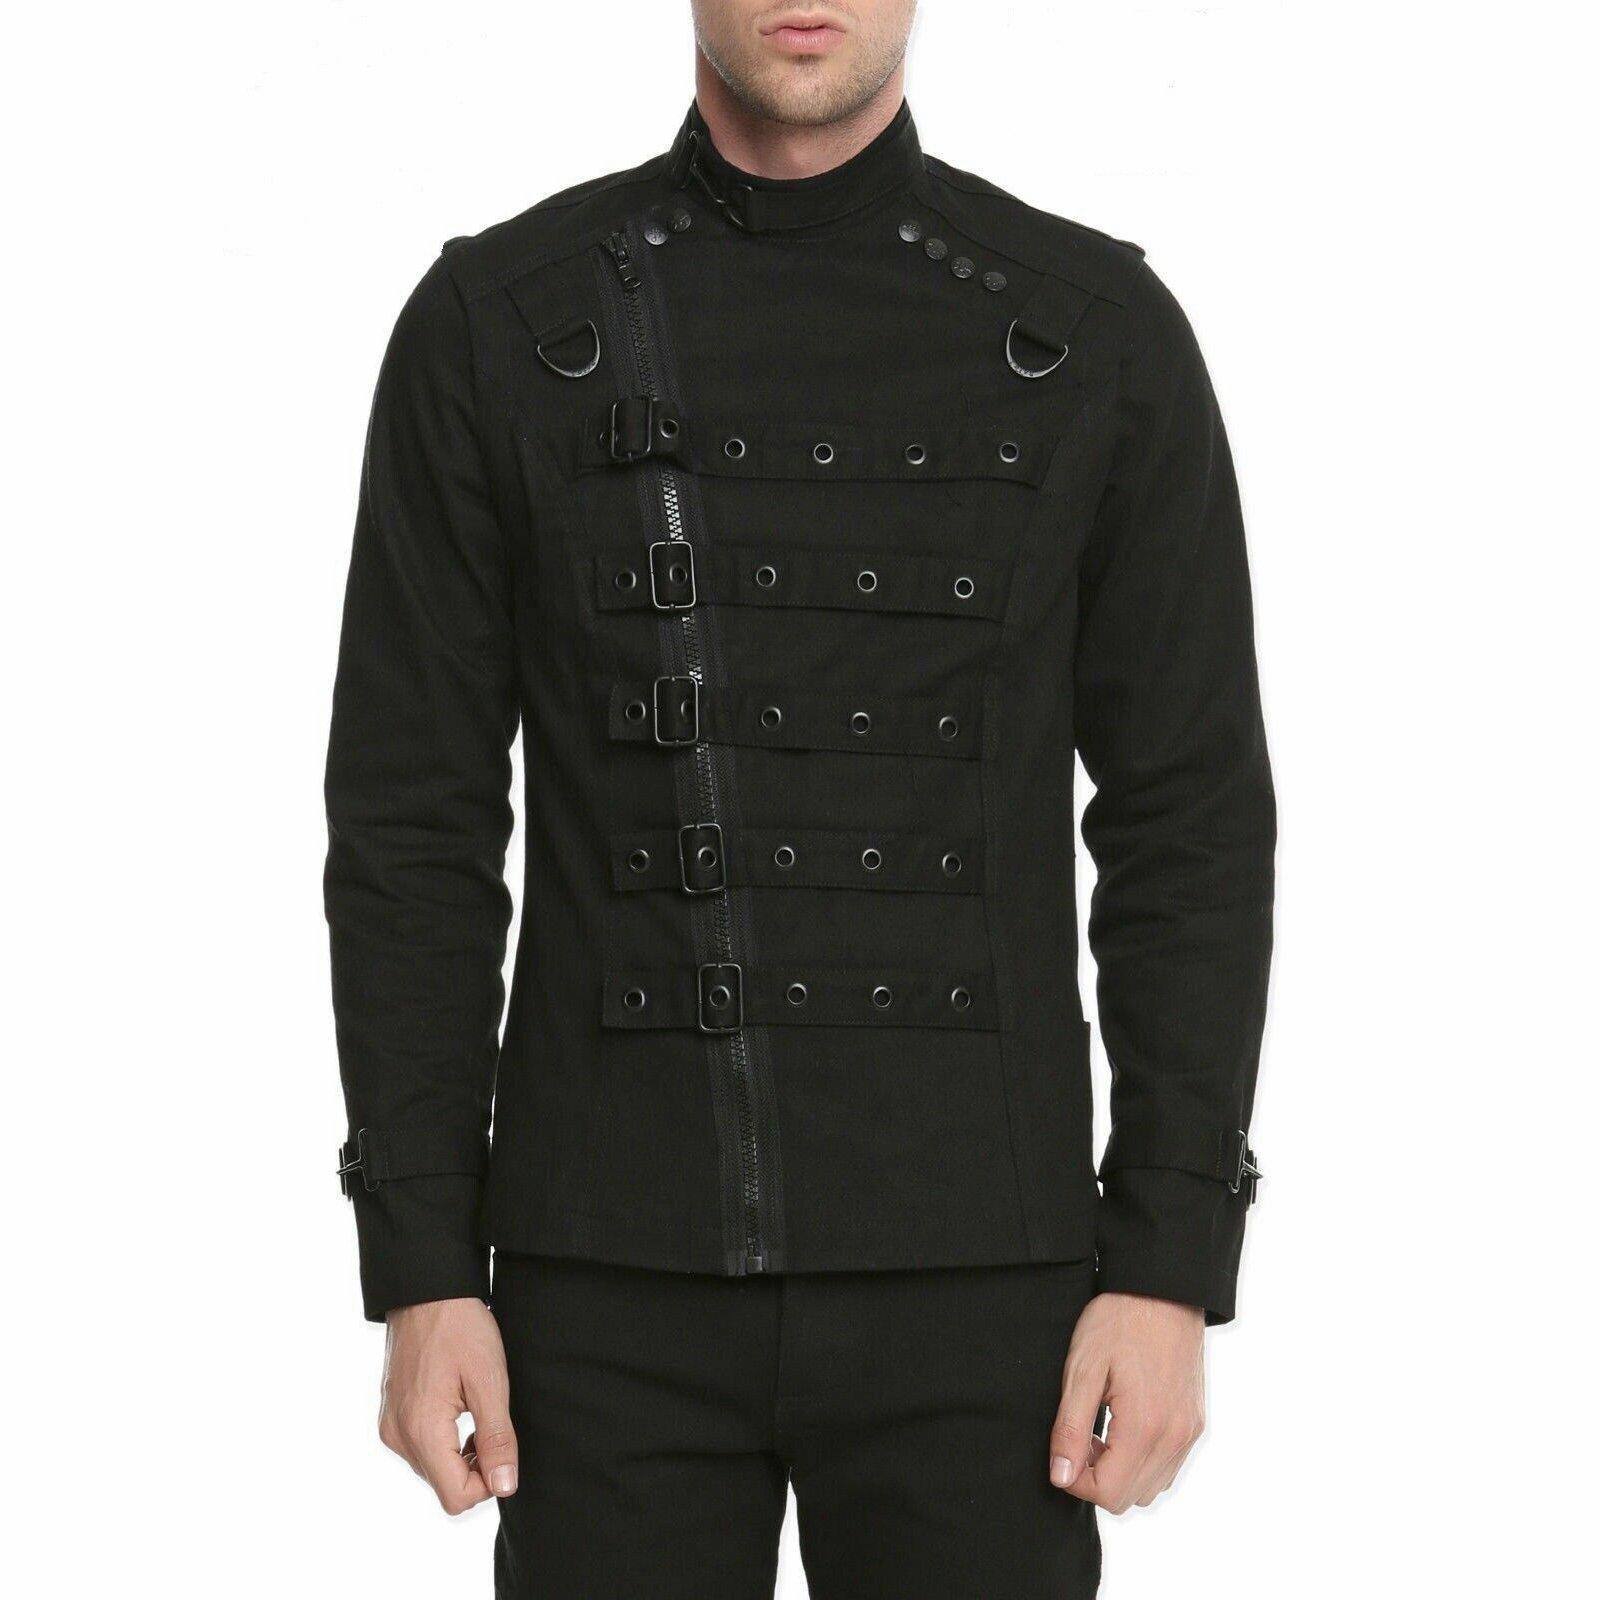 Goth Punk Bullet Bondage Psycho Band Heavy Metal Jacket Coat (1)